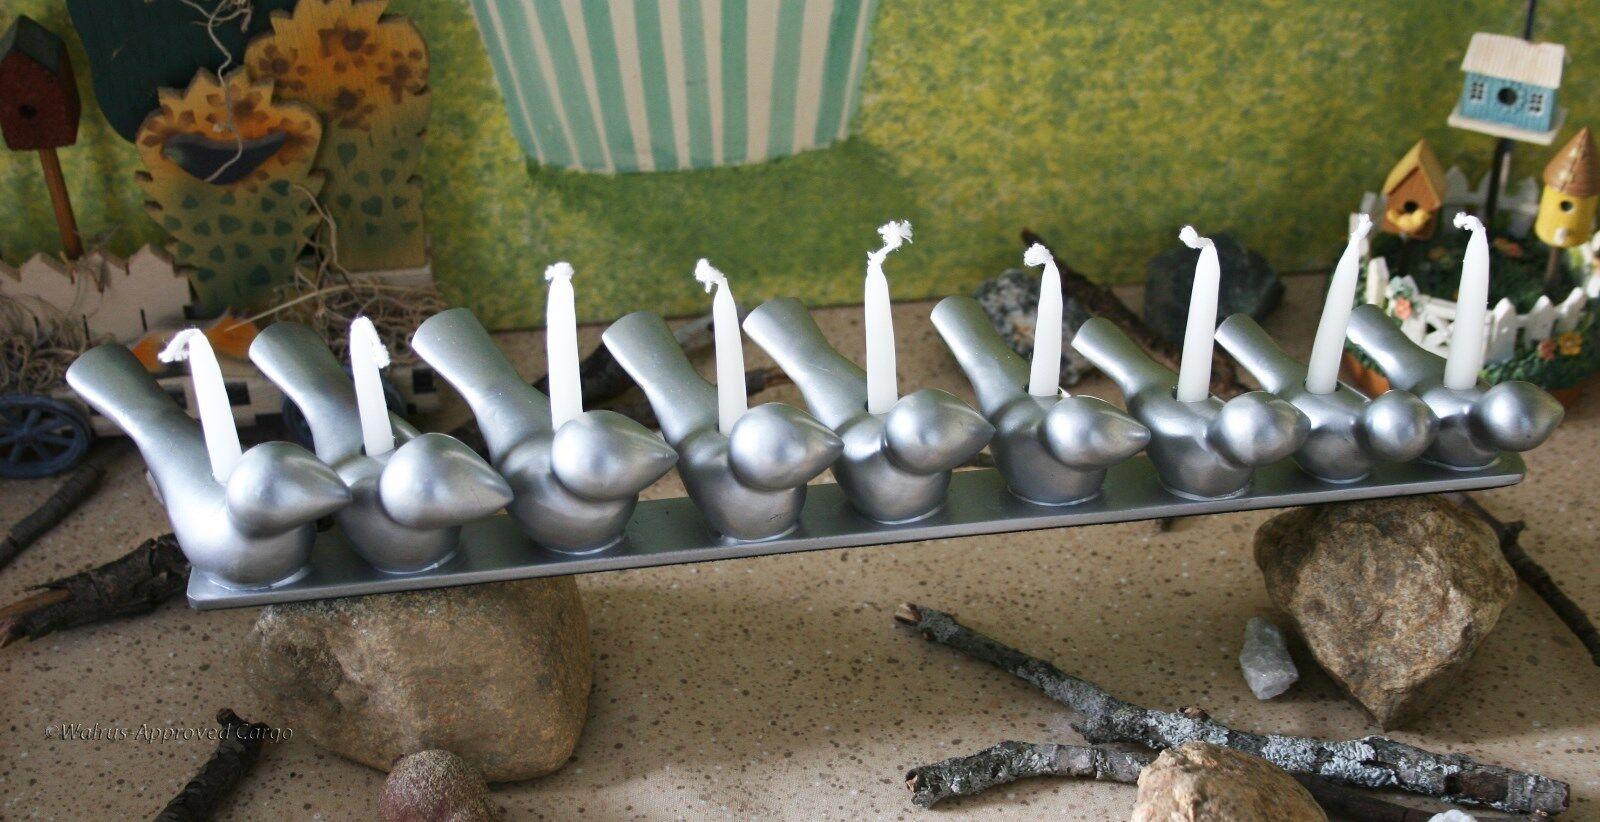 CRATE & BARREL KIDS LITTLE BIRDS MENORAH CANDELABRA NIB LIGHT THE WAY TO FUN